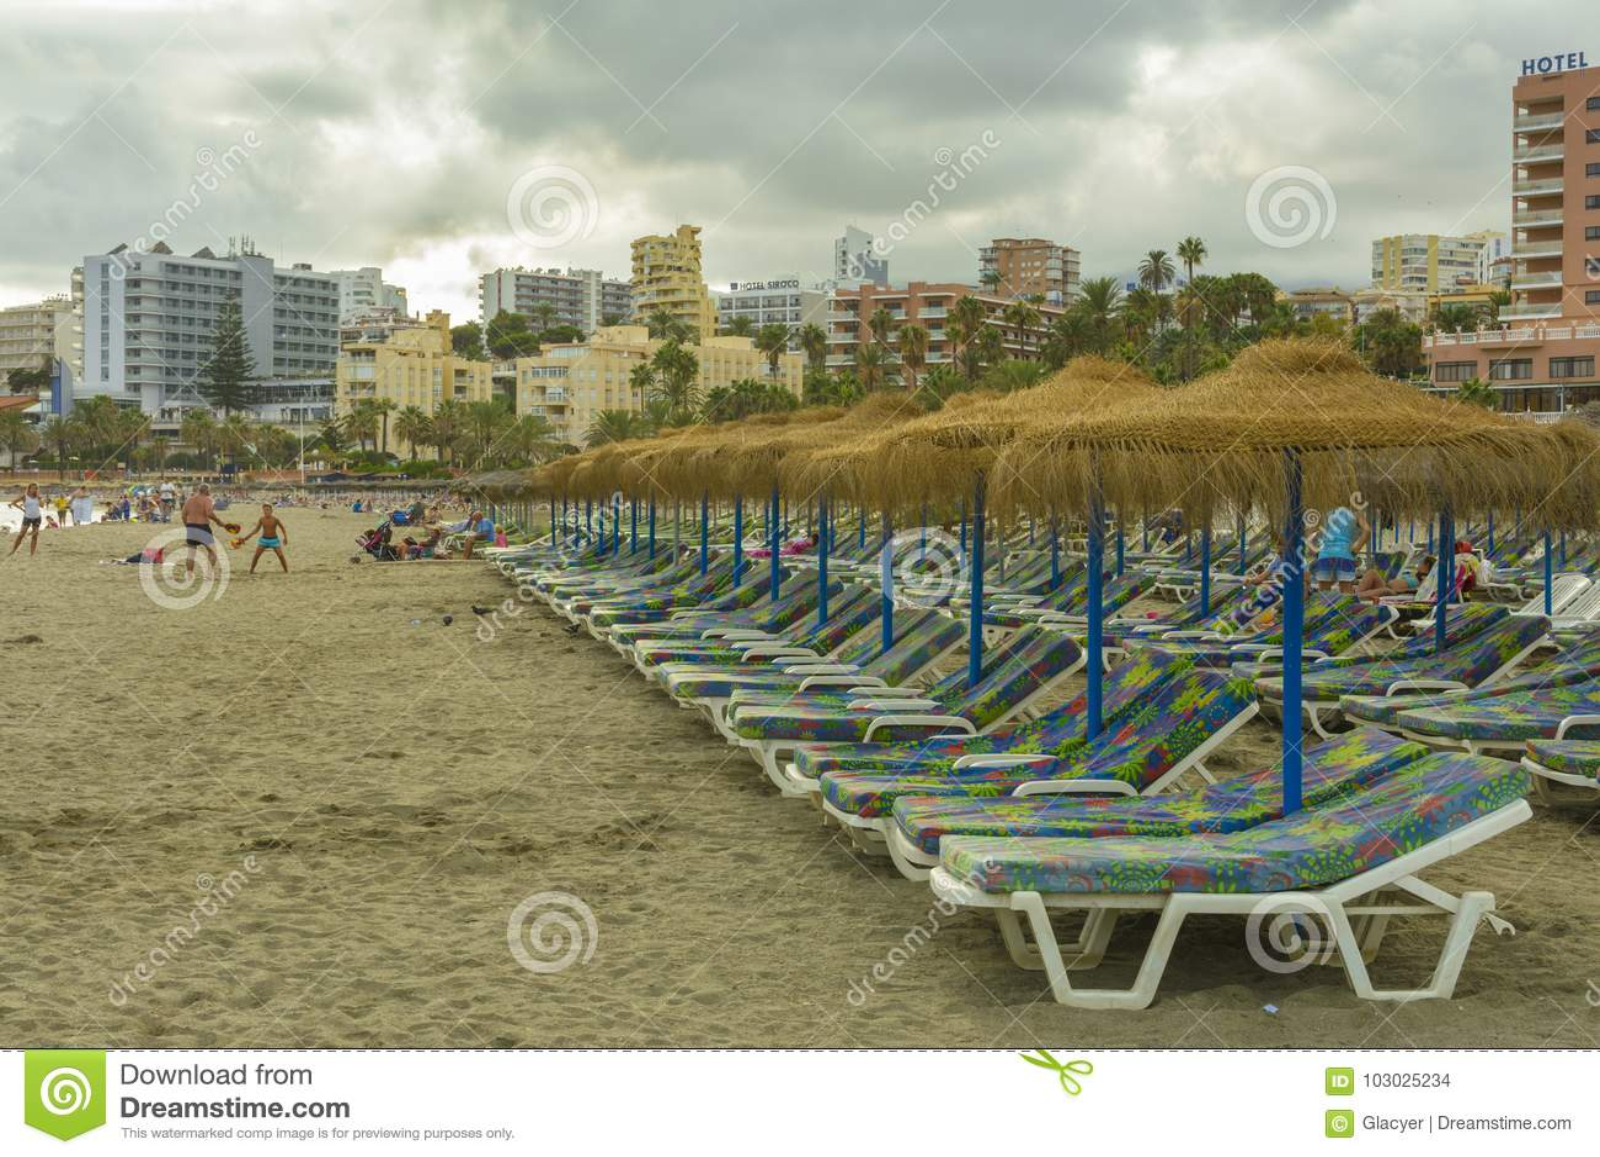 Benalmadena plaża, Andalucia prowincja, Hiszpania